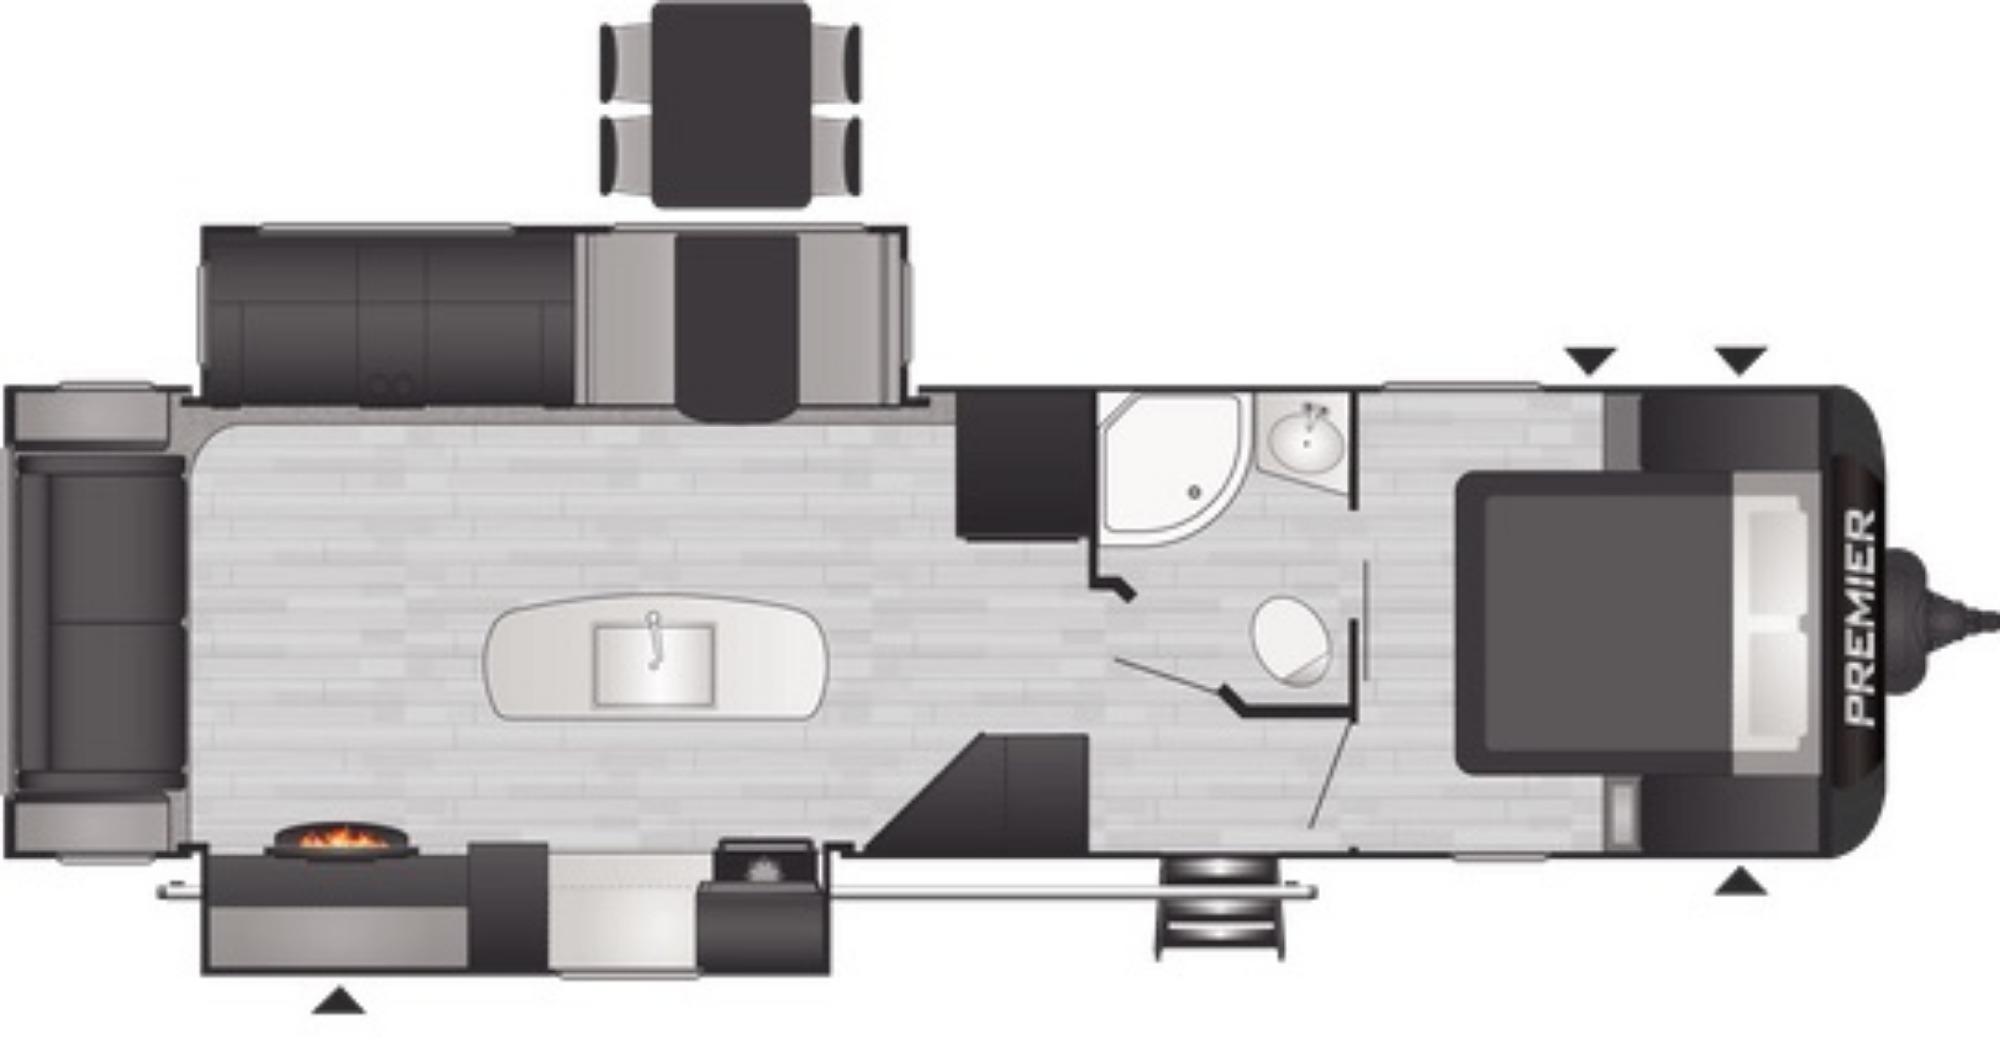 View Floor Plan for 2021 KEYSTONE PREMIER 30RI